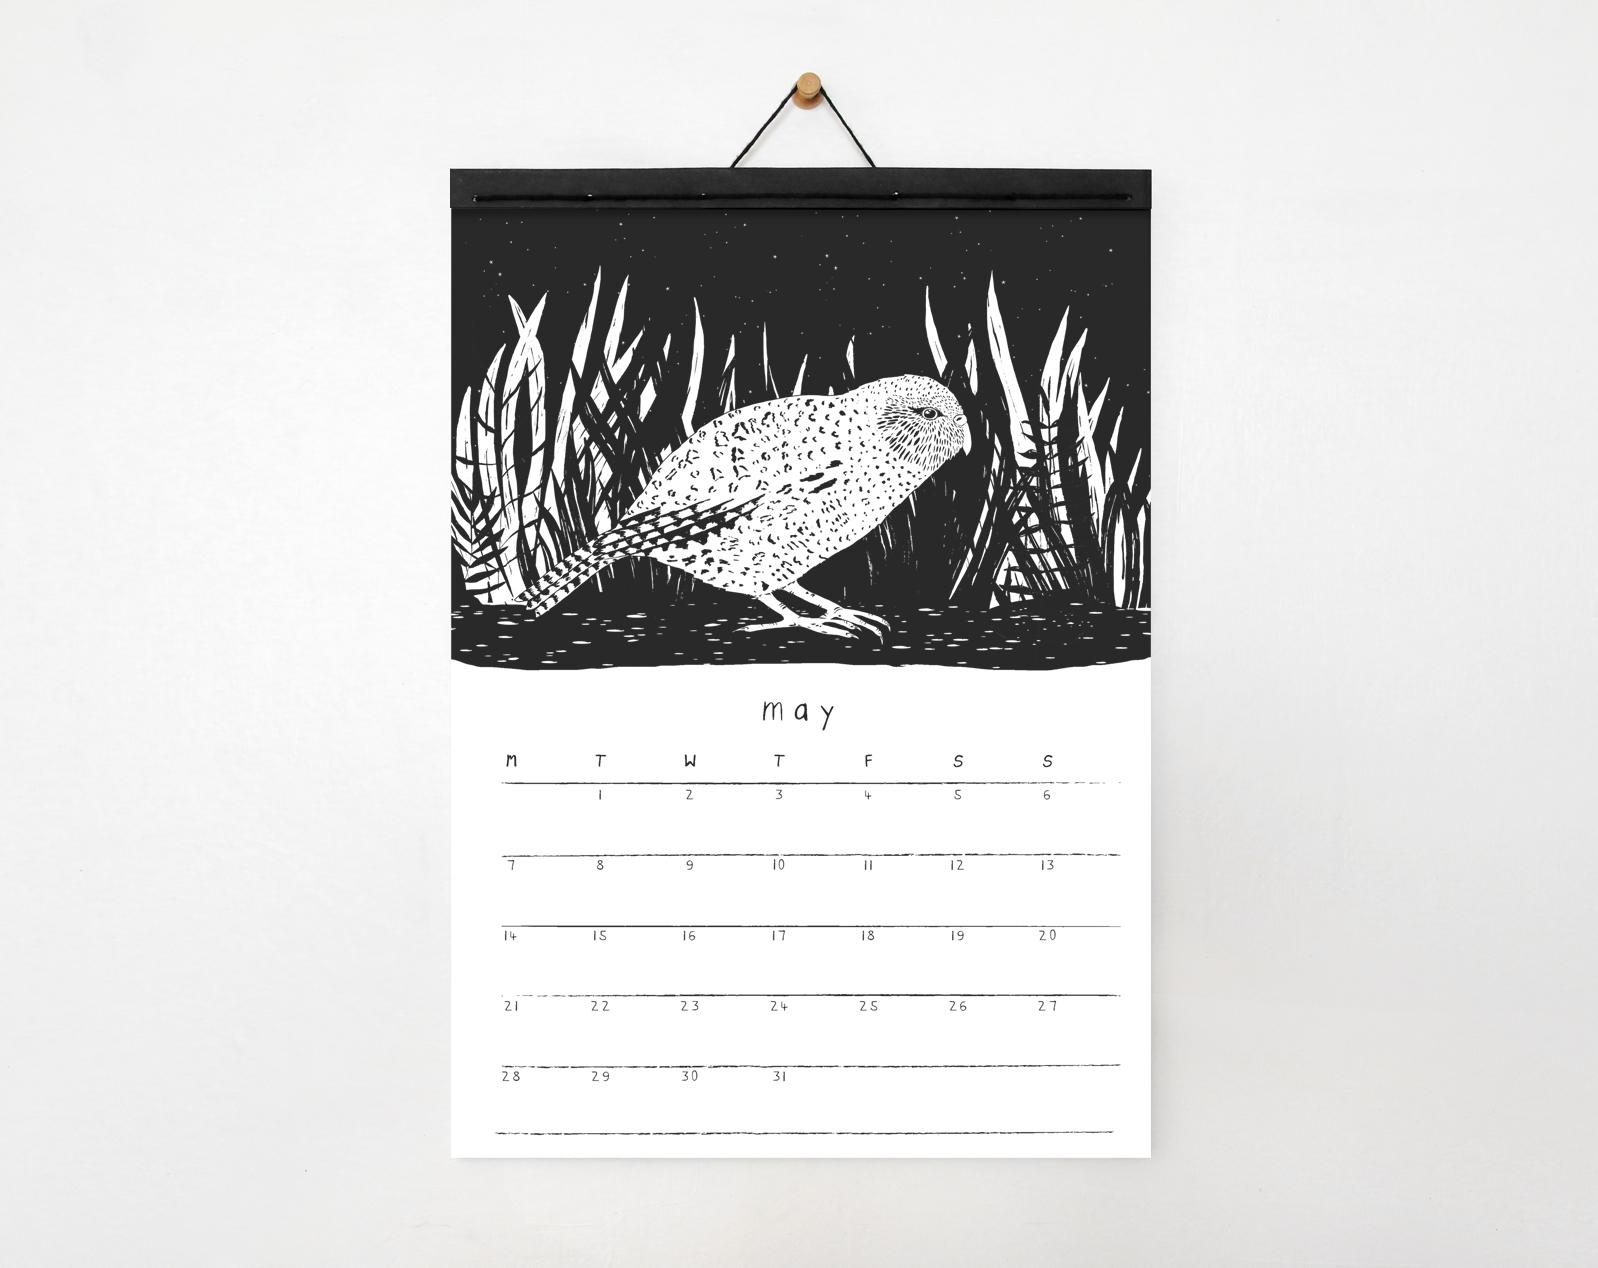 bird-plus-bird-a4-black-calendar-06.jpg